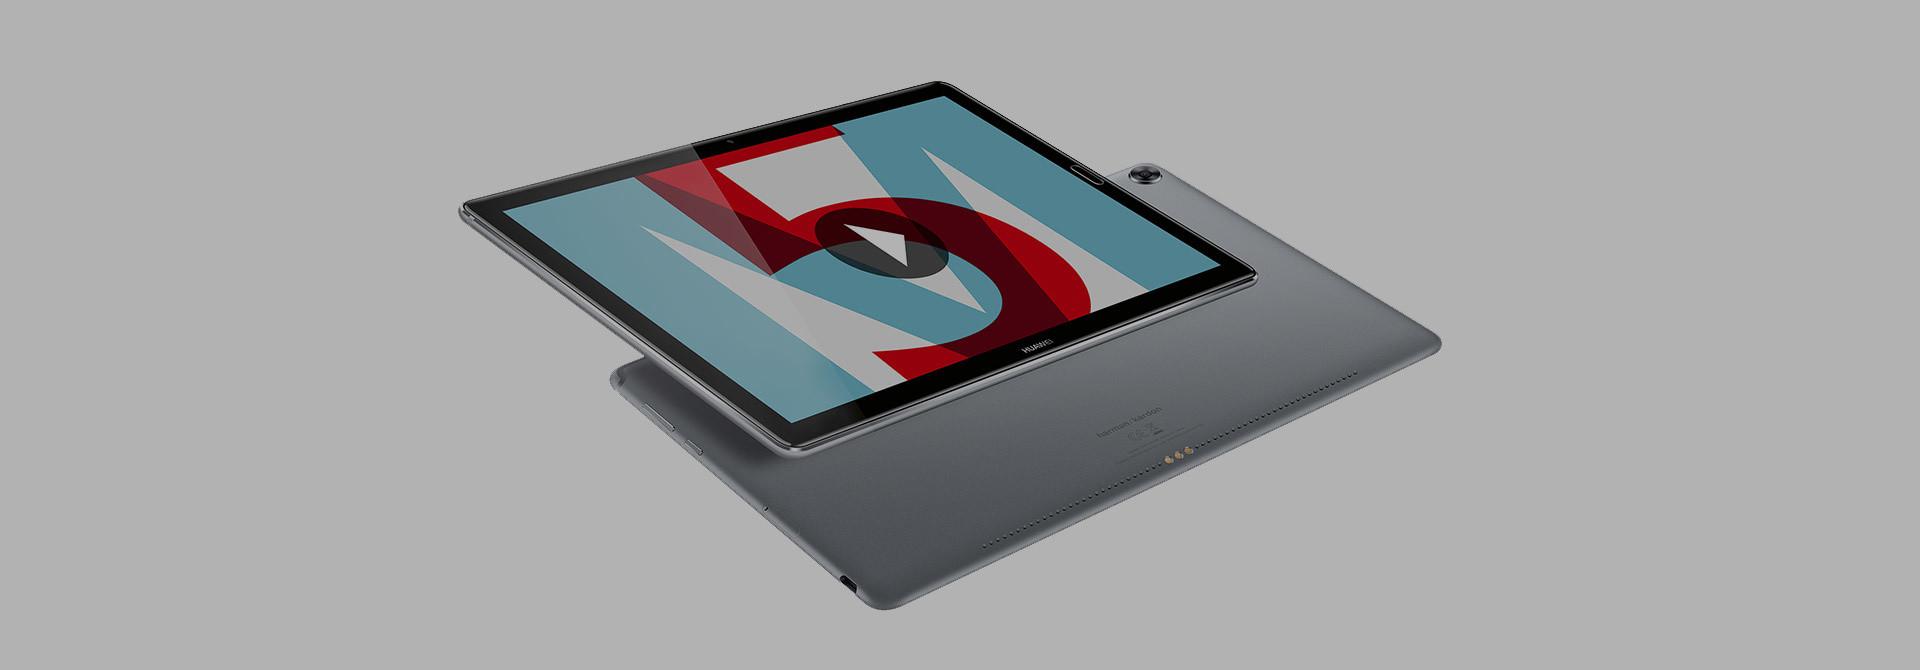 Huawei MediaPad Sleeve